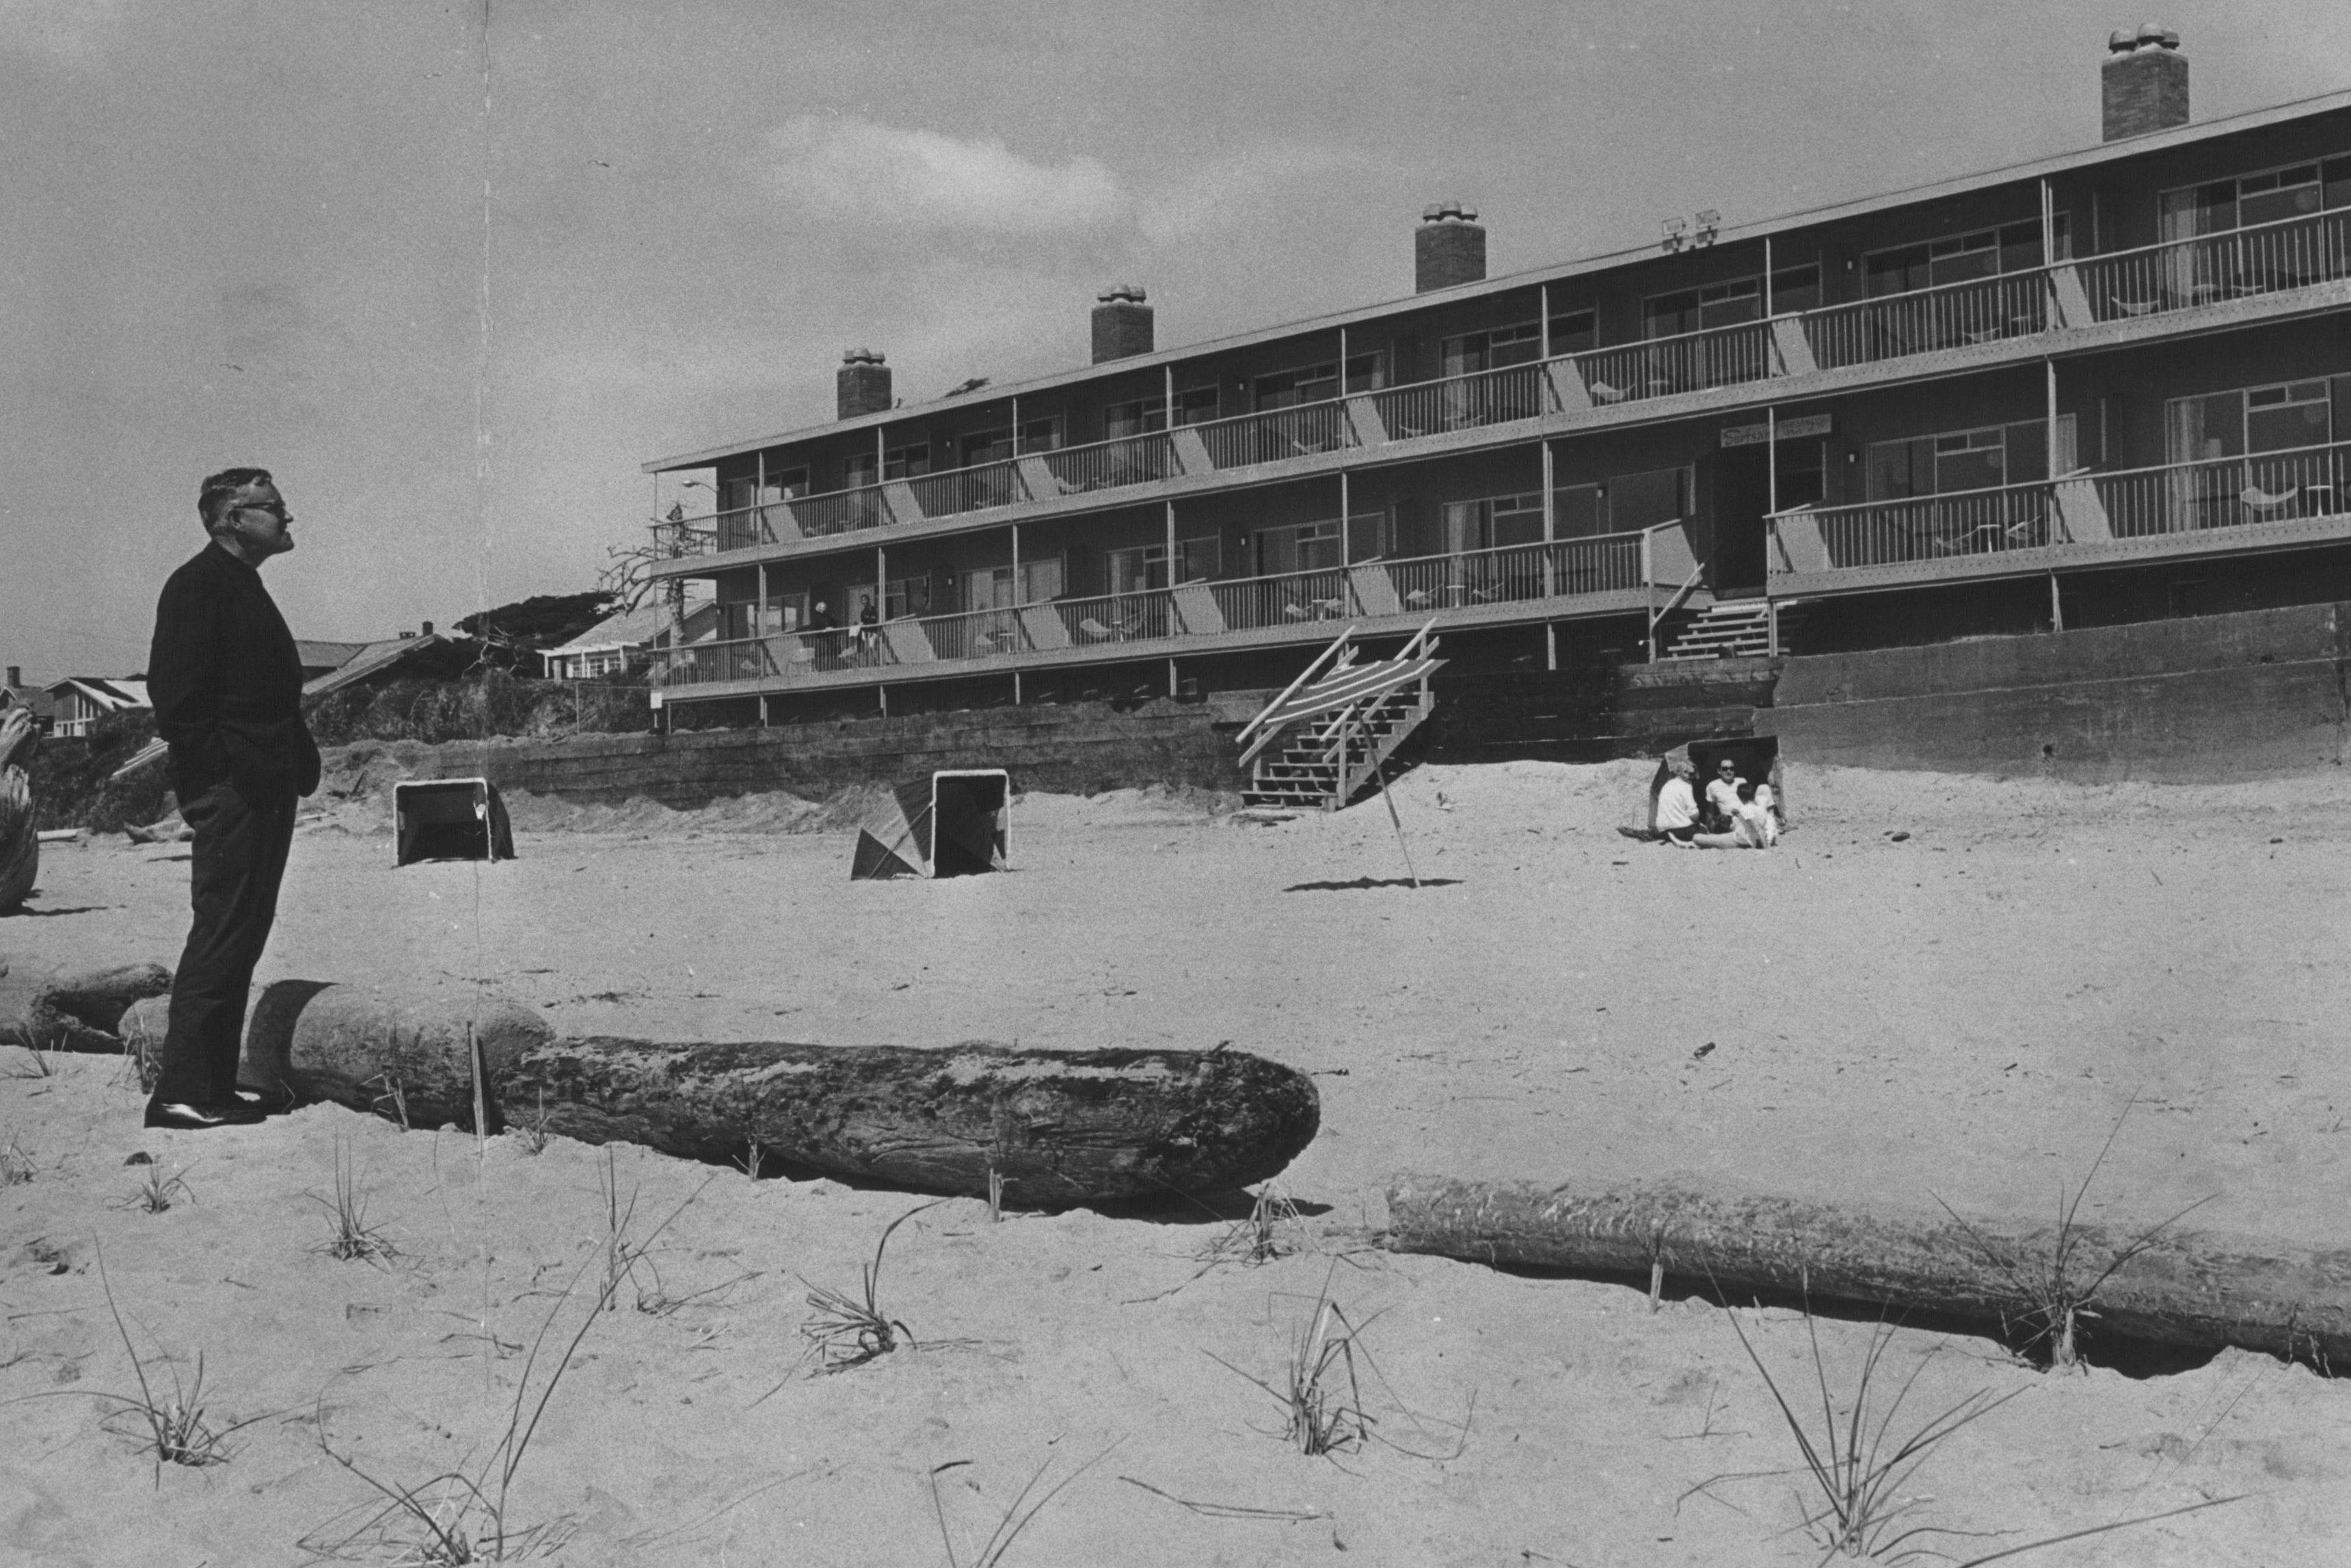 0817 beach bill wjhvki